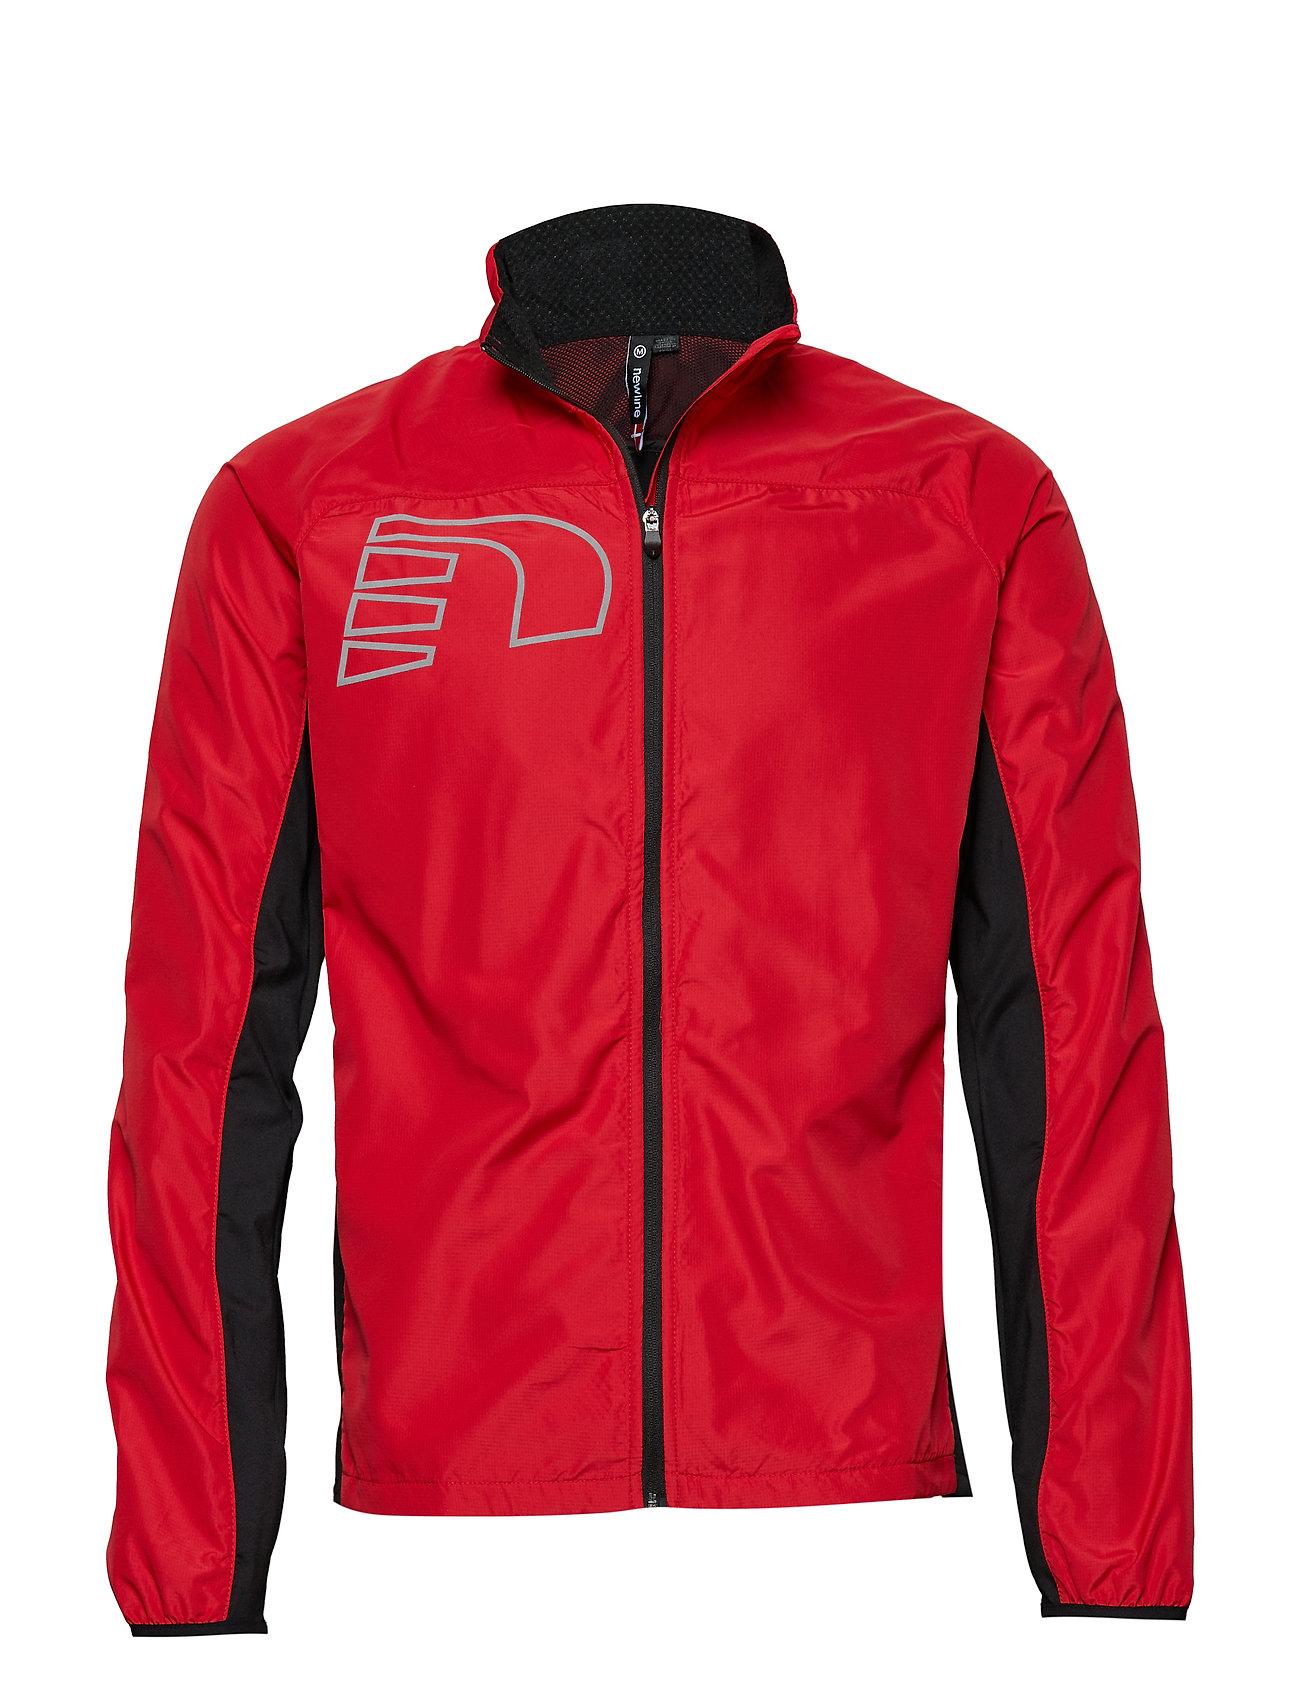 Newline Core Cross Jacket Outerwear Sport Jackets Röd Newline